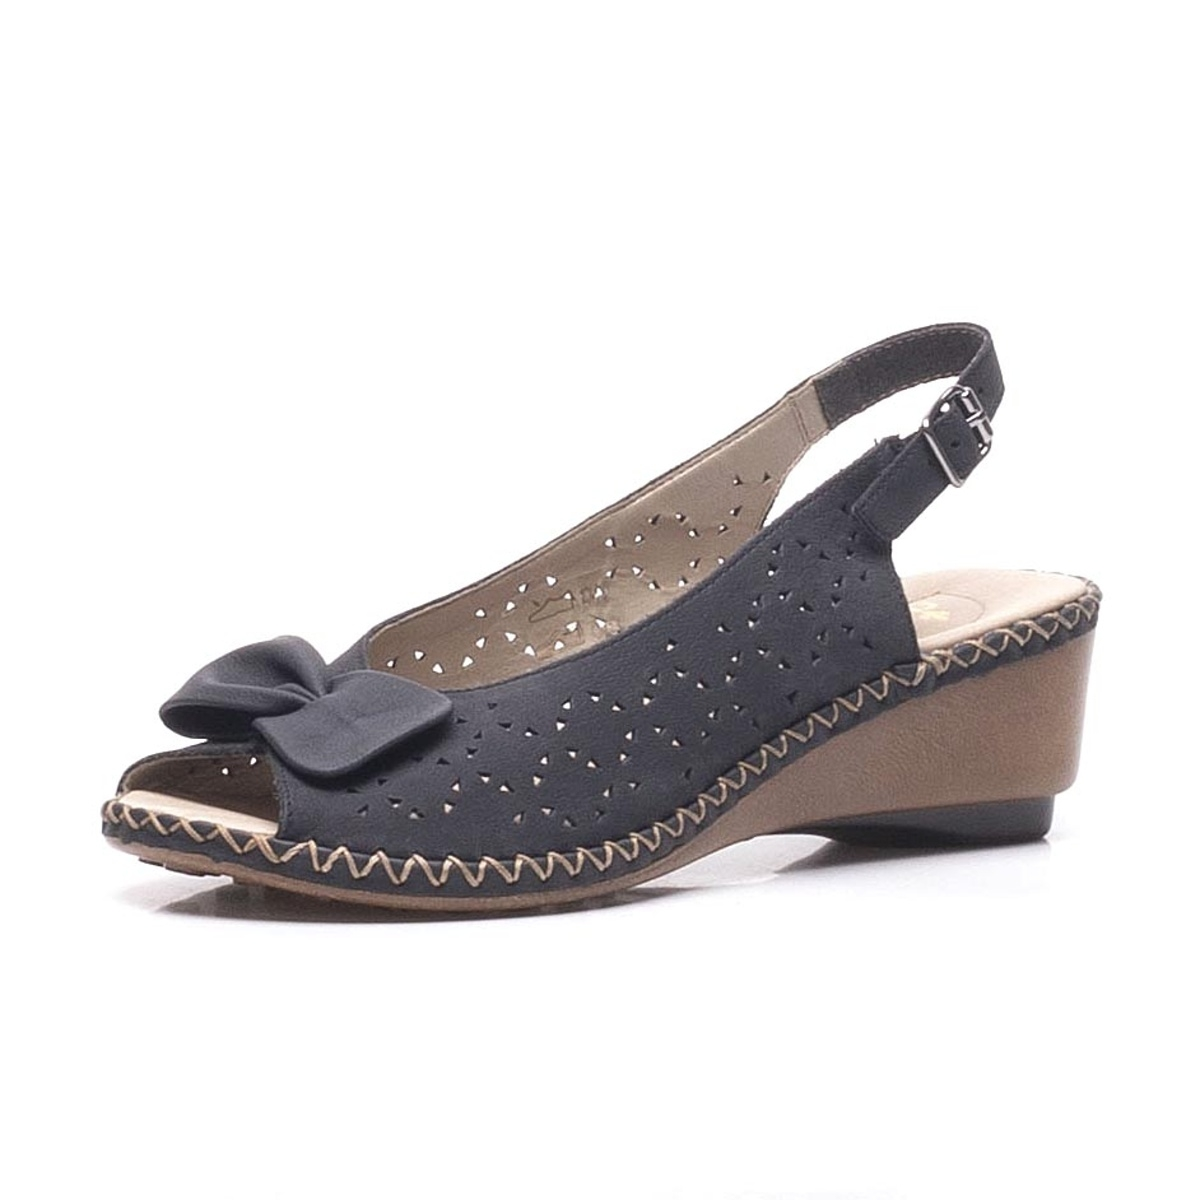 3272a229f5a4 detail Dámska obuv RIEKER br 66178-14 BLAU ...